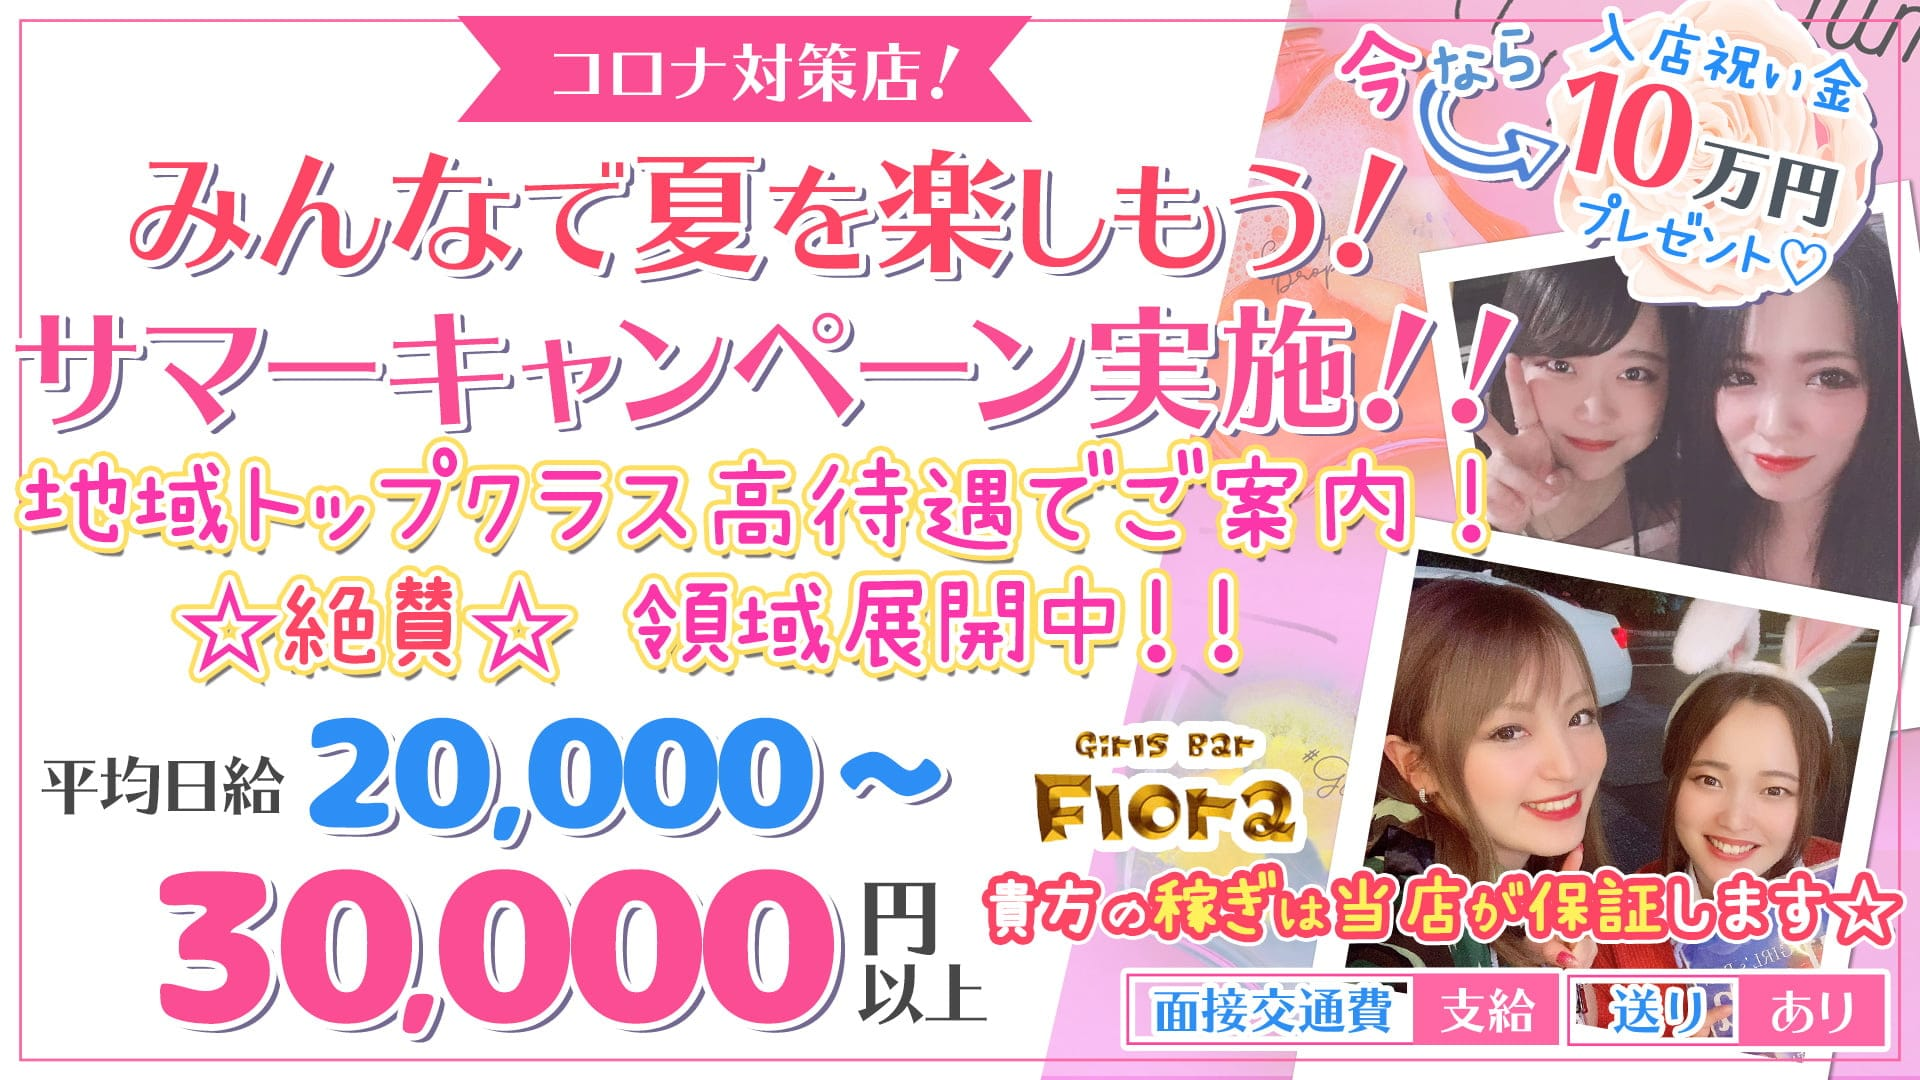 Girls Bar Flora (フローラ)【公式求人・体入情報】 千葉ガールズバー TOP画像